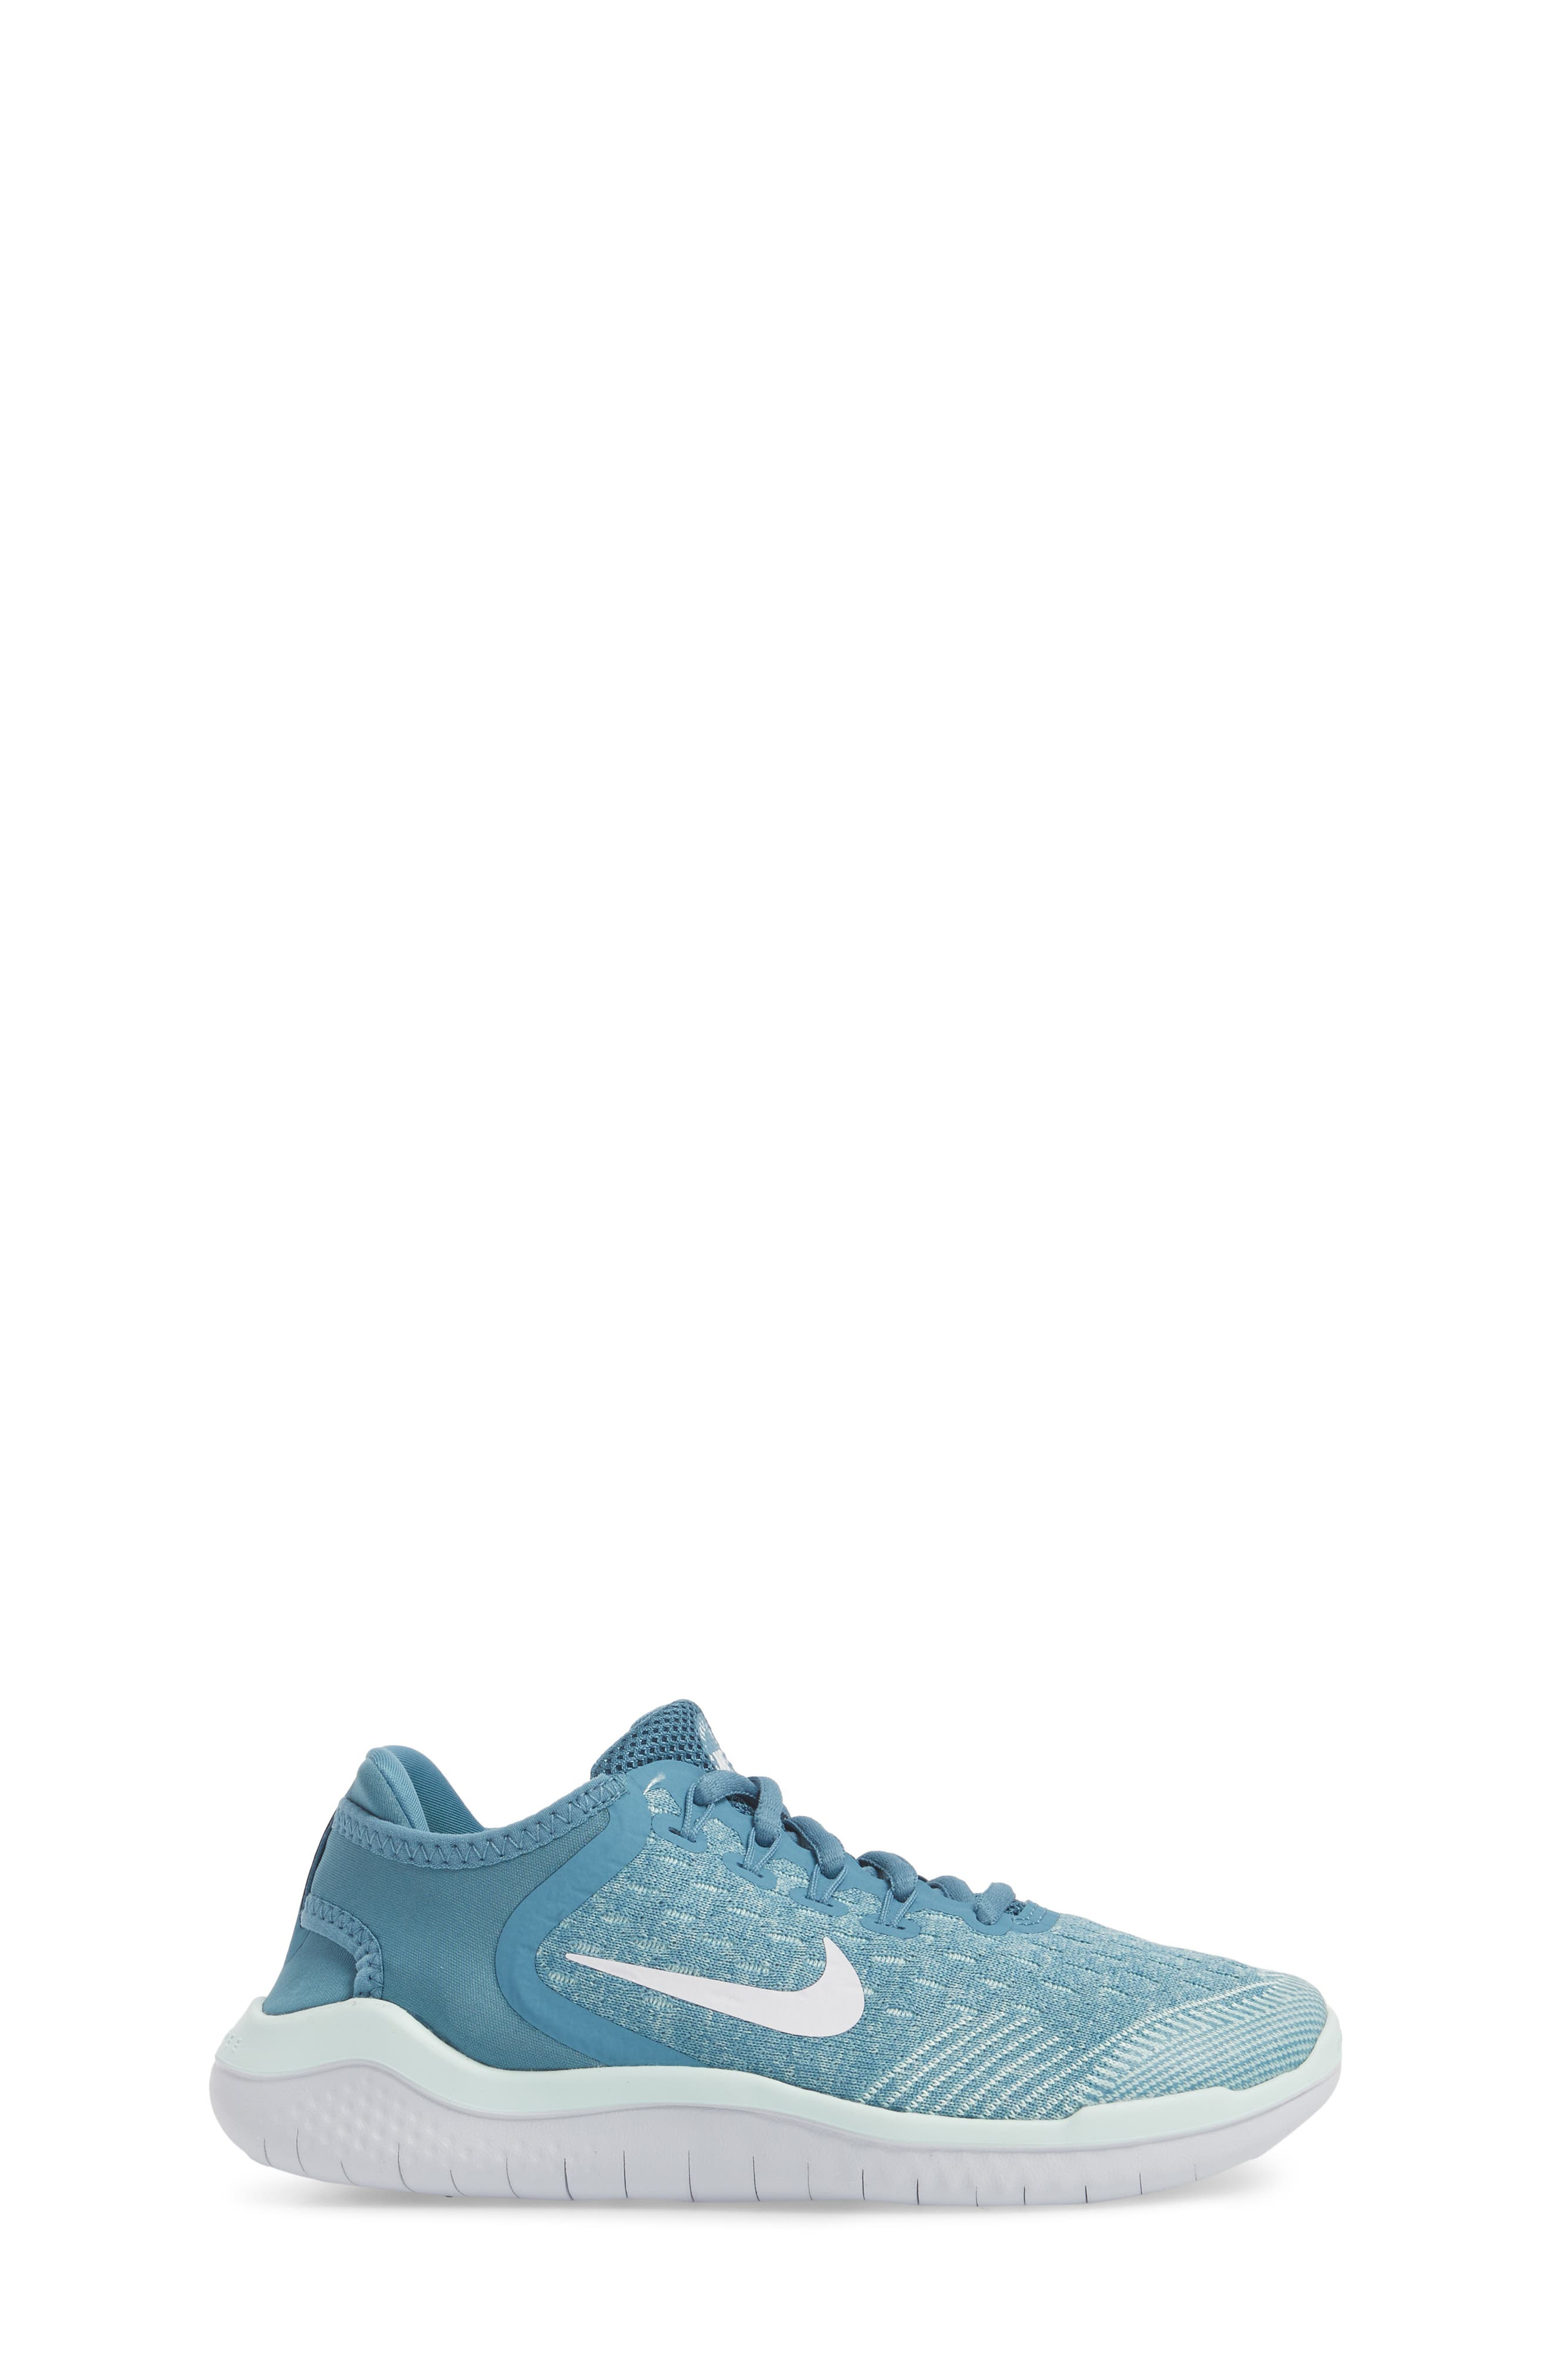 Free RN 2018 Running Shoe,                             Alternate thumbnail 3, color,                             AQUA/ WHITE/ PURE PLATINUM